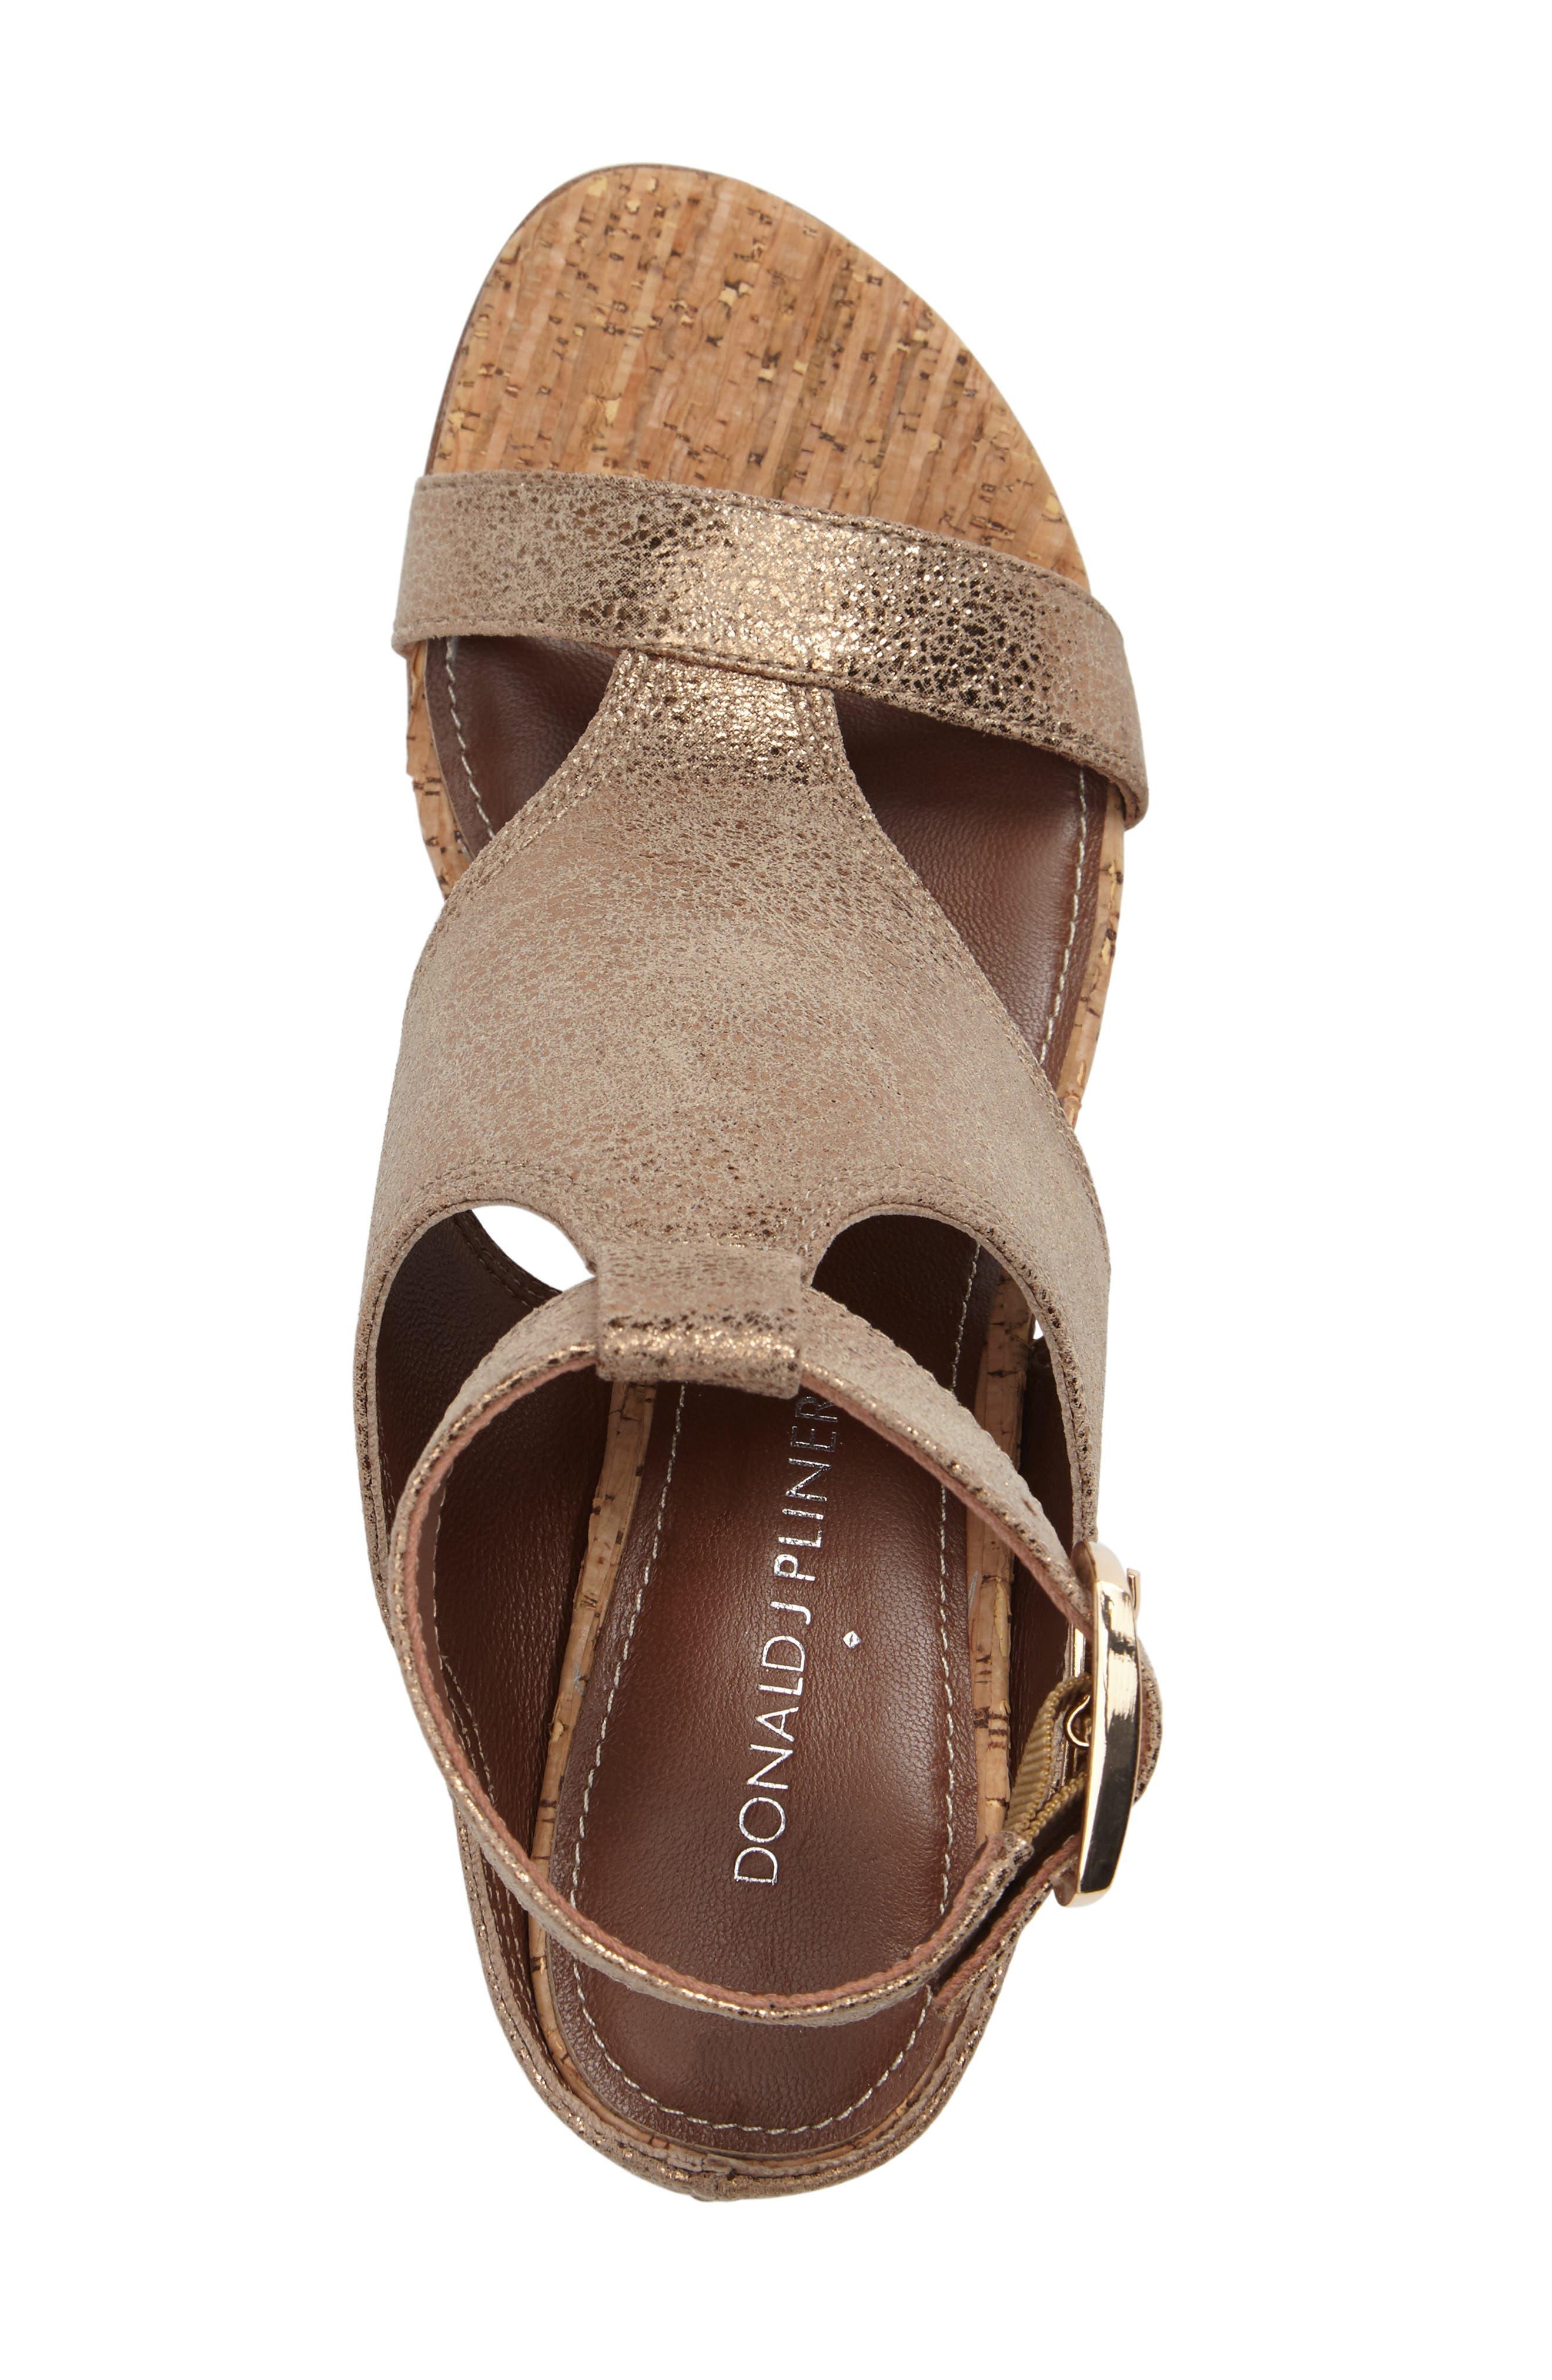 Donald J Pliner Ellee Block Heel Sandal,                             Alternate thumbnail 9, color,